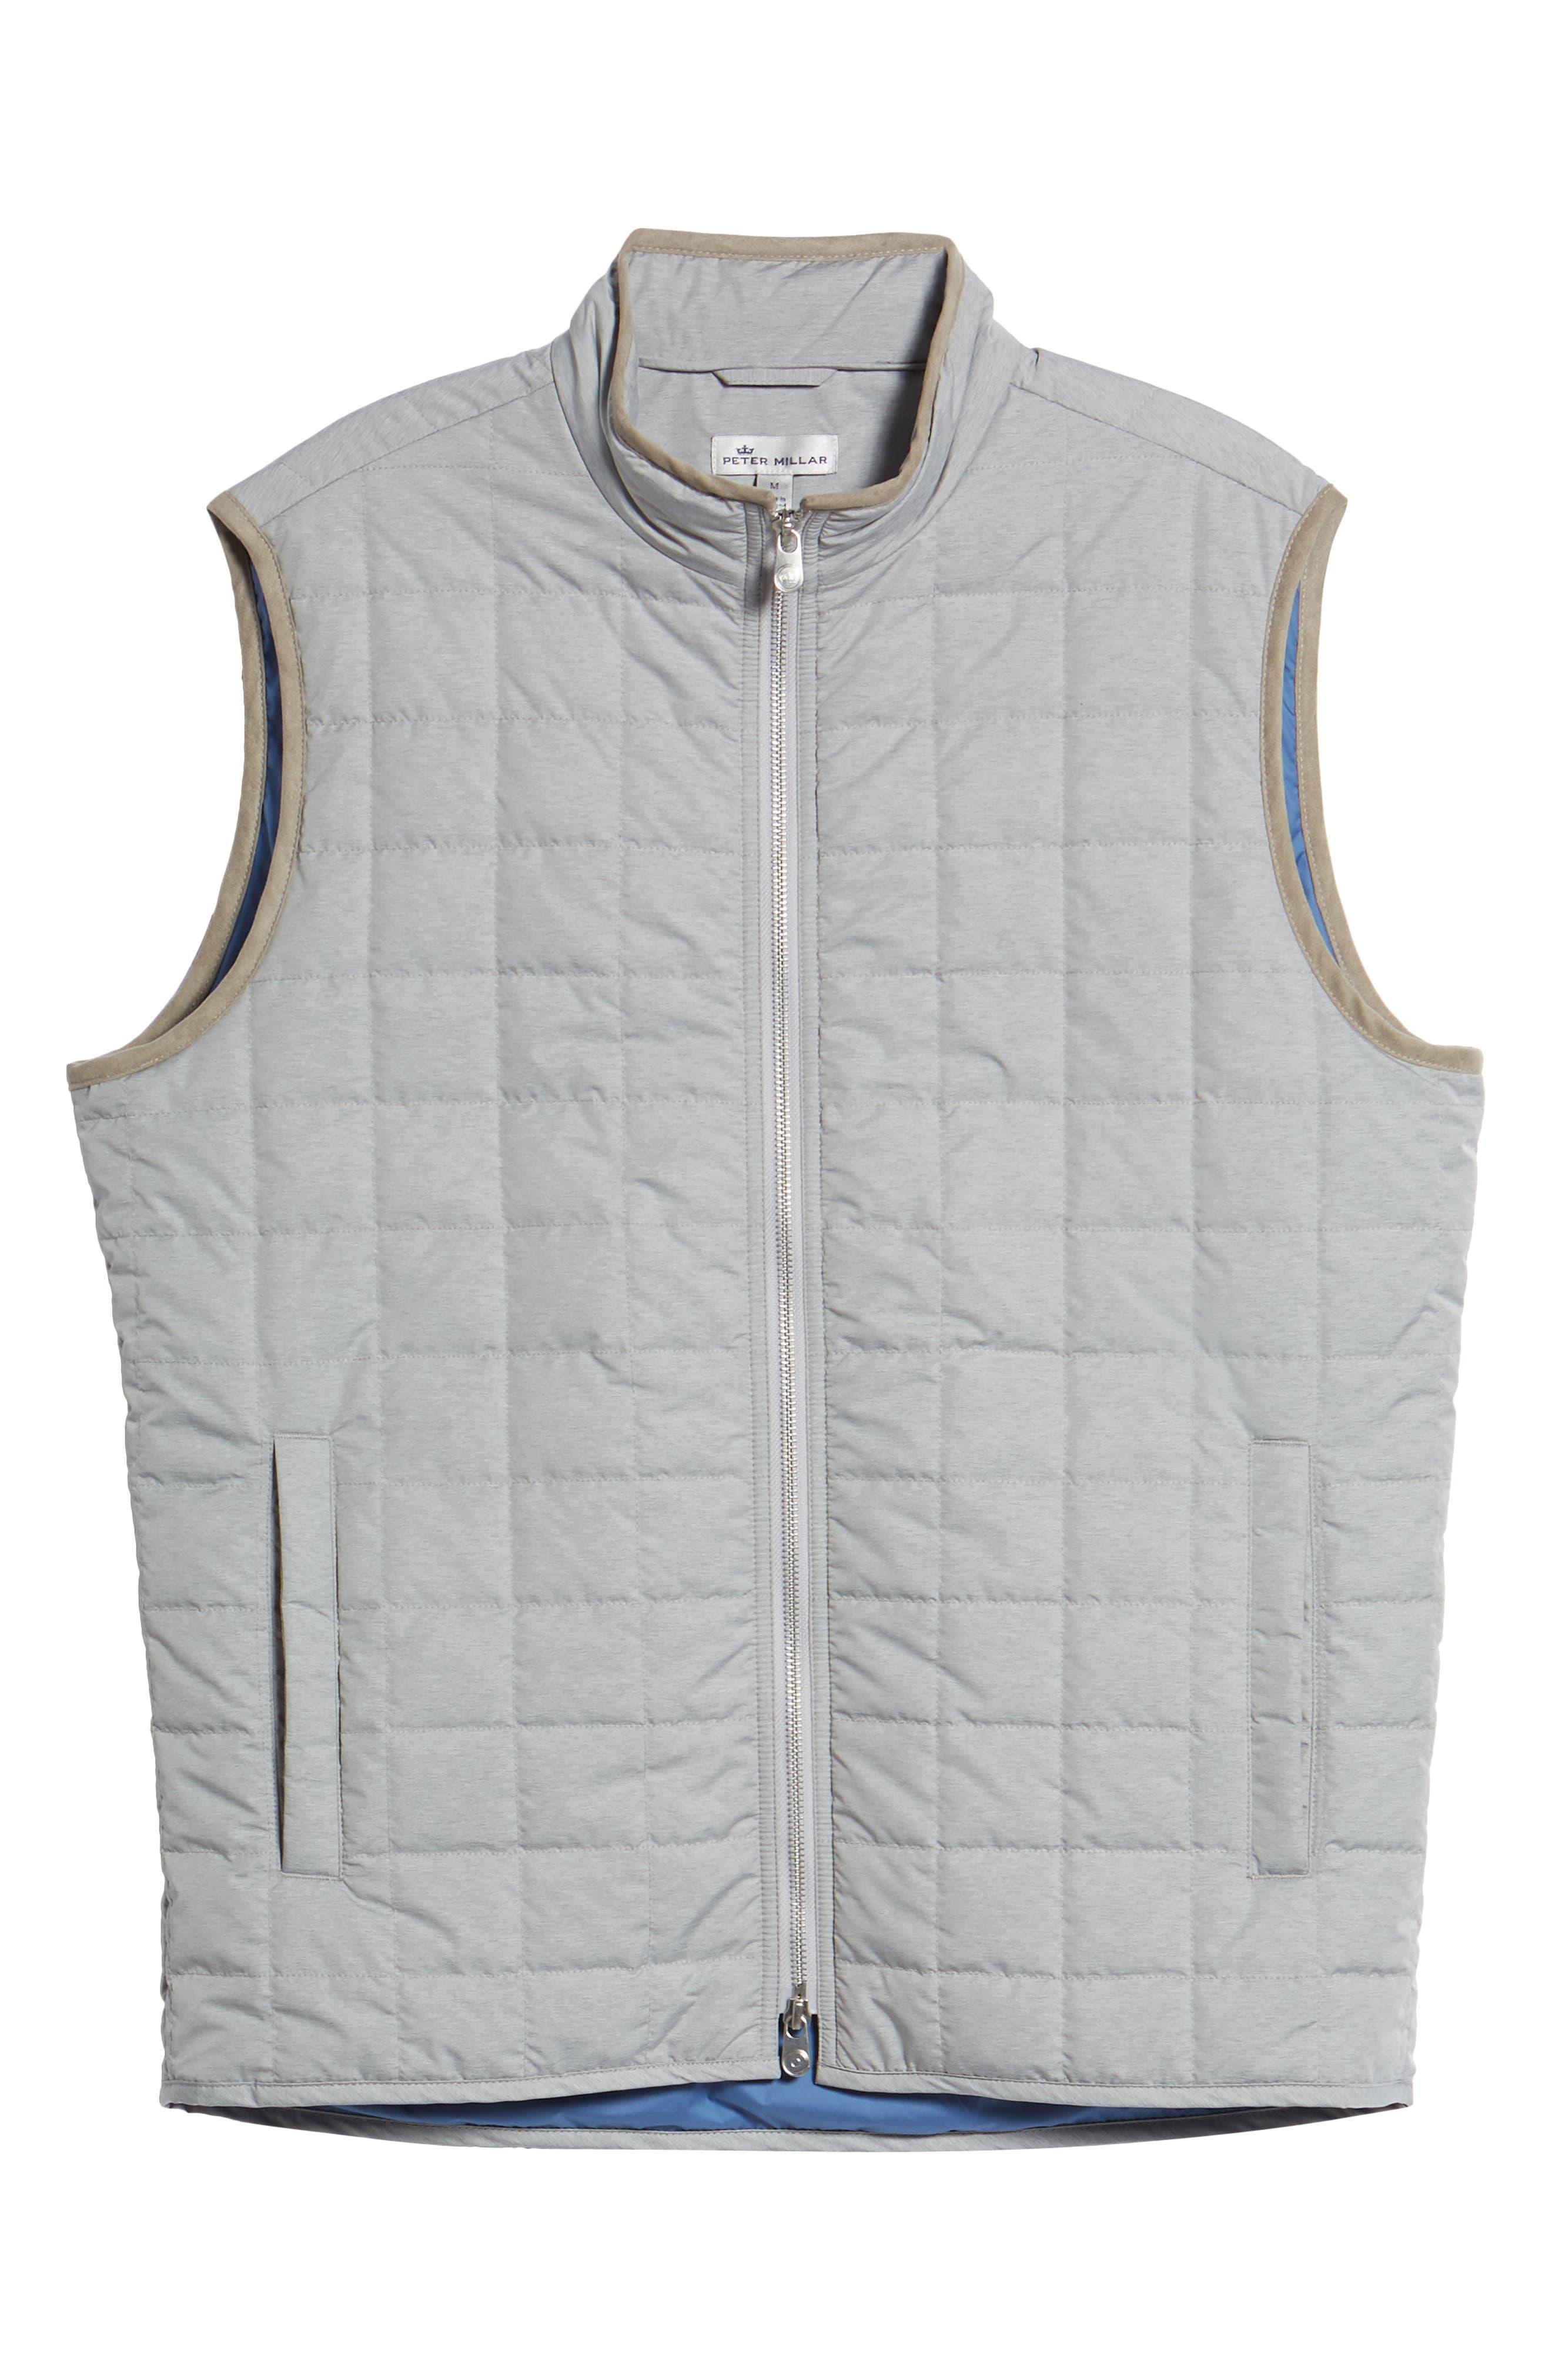 Seneca Quilted Vest,                             Alternate thumbnail 6, color,                             BRITISH GREY